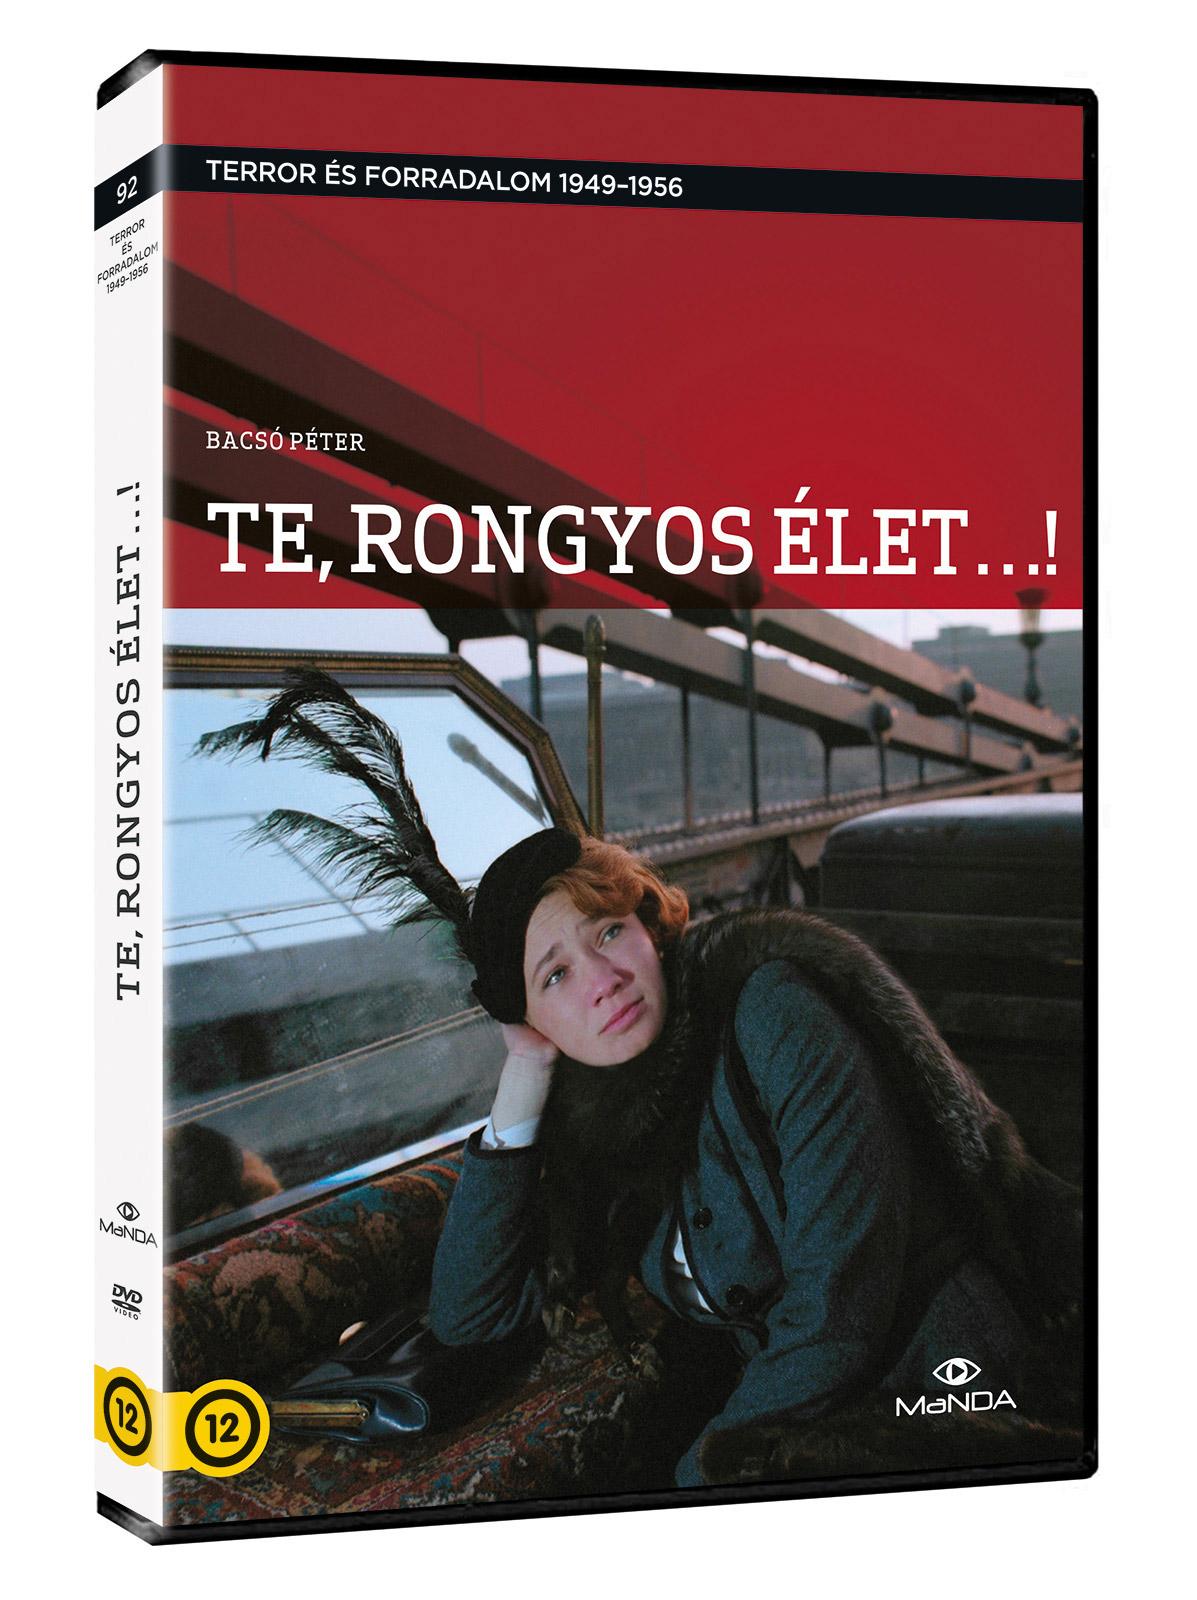 Te, rongyos �let?! DVD